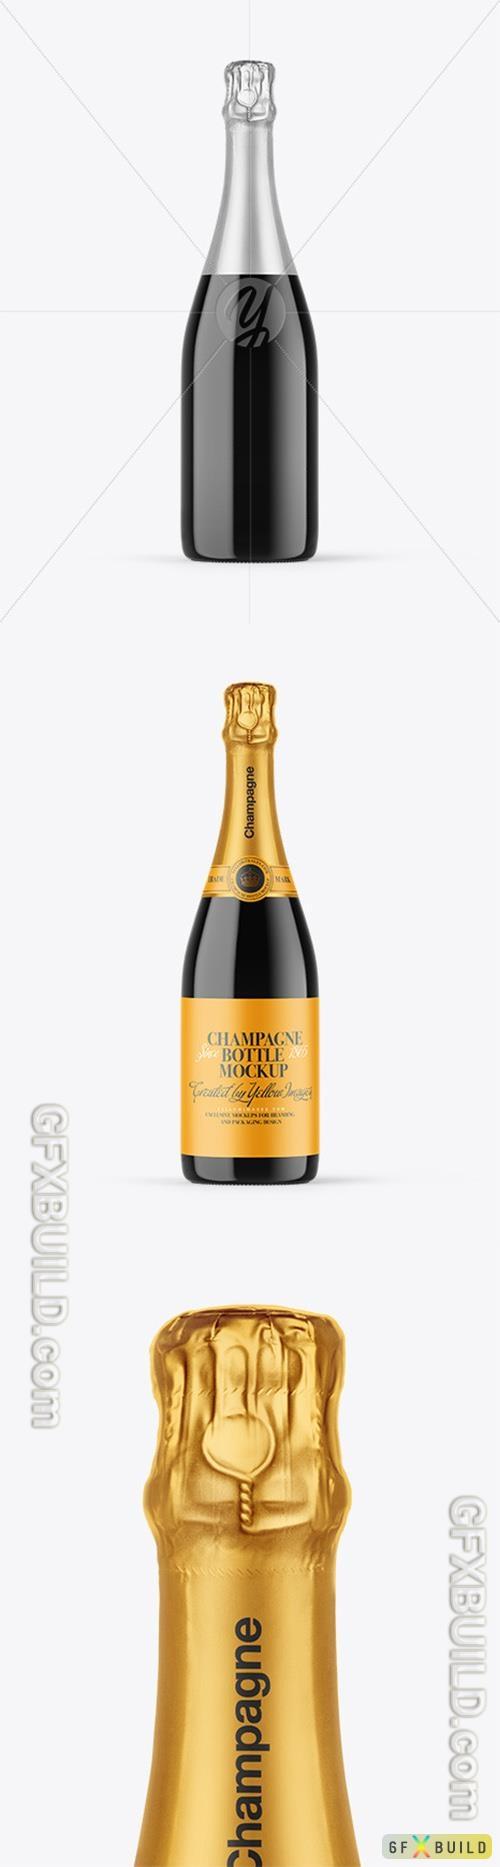 Dark Glass Champagne Bottle Mockup 89331